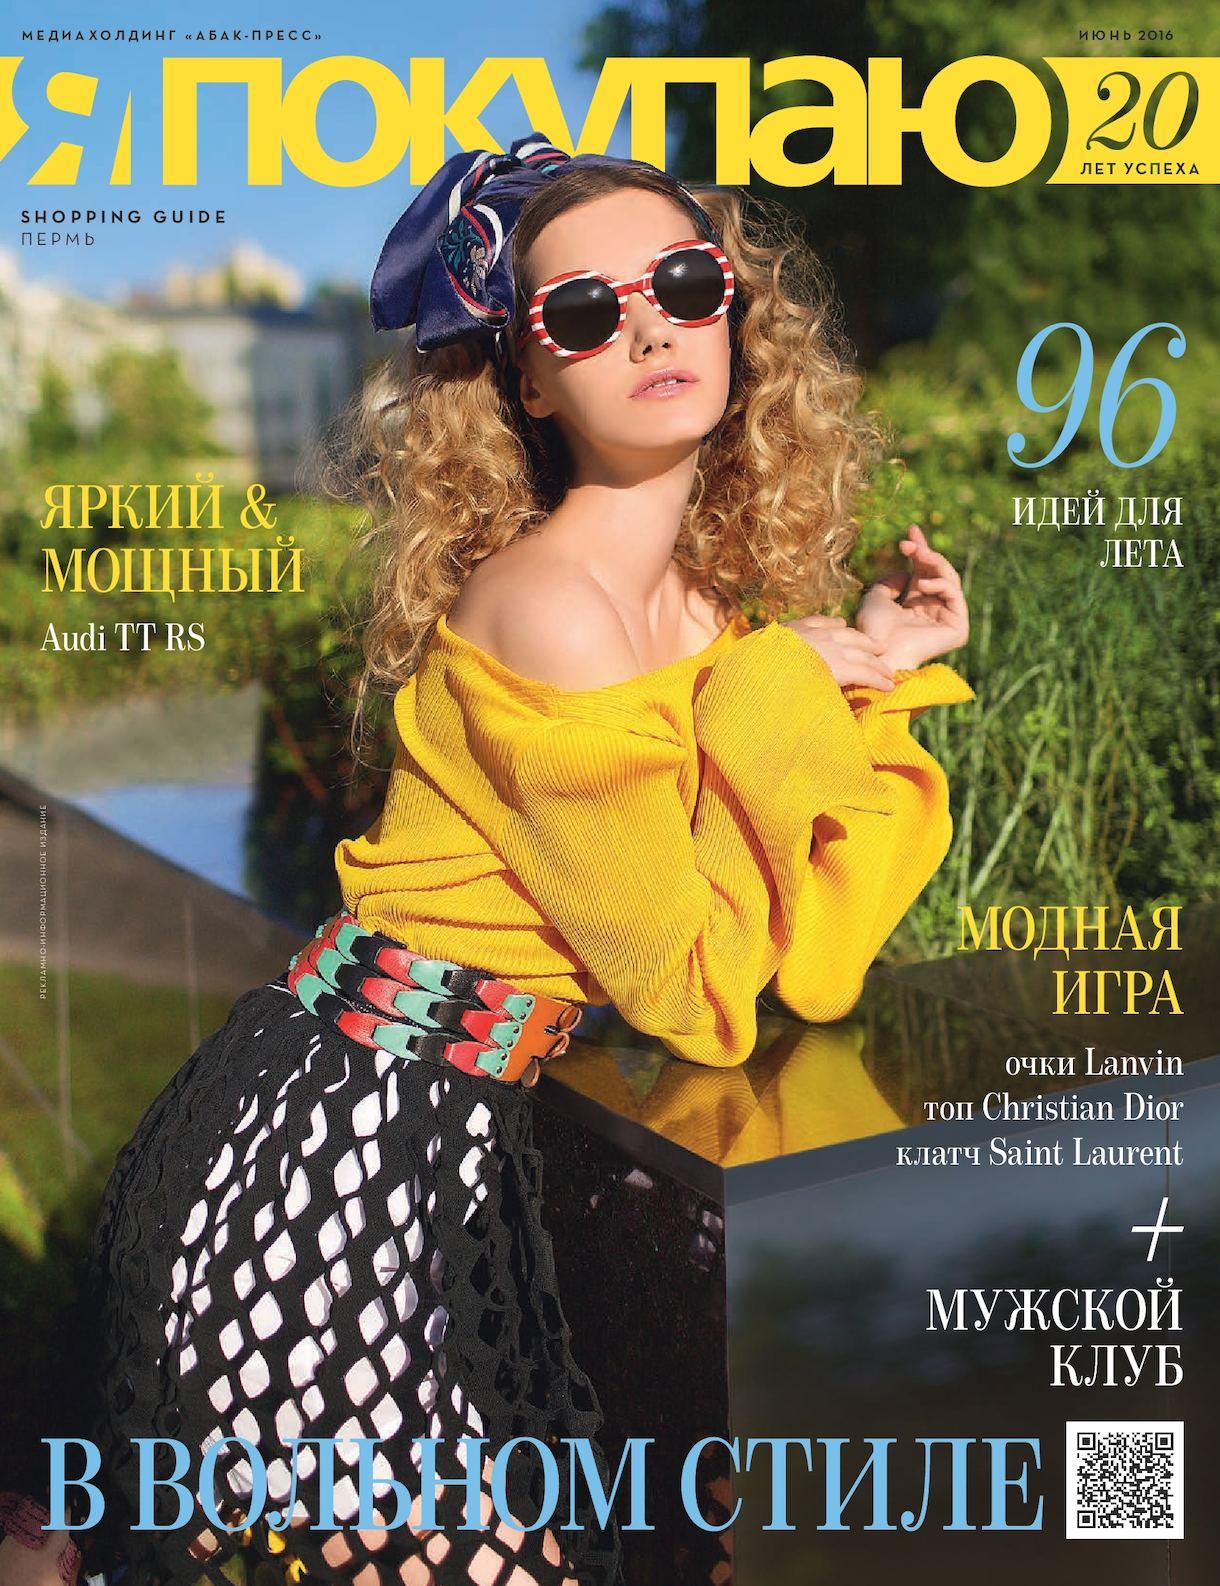 ec1a15df9774 Calaméo - Shopping Guide «Я Покупаю. Пермь», июнь 2016